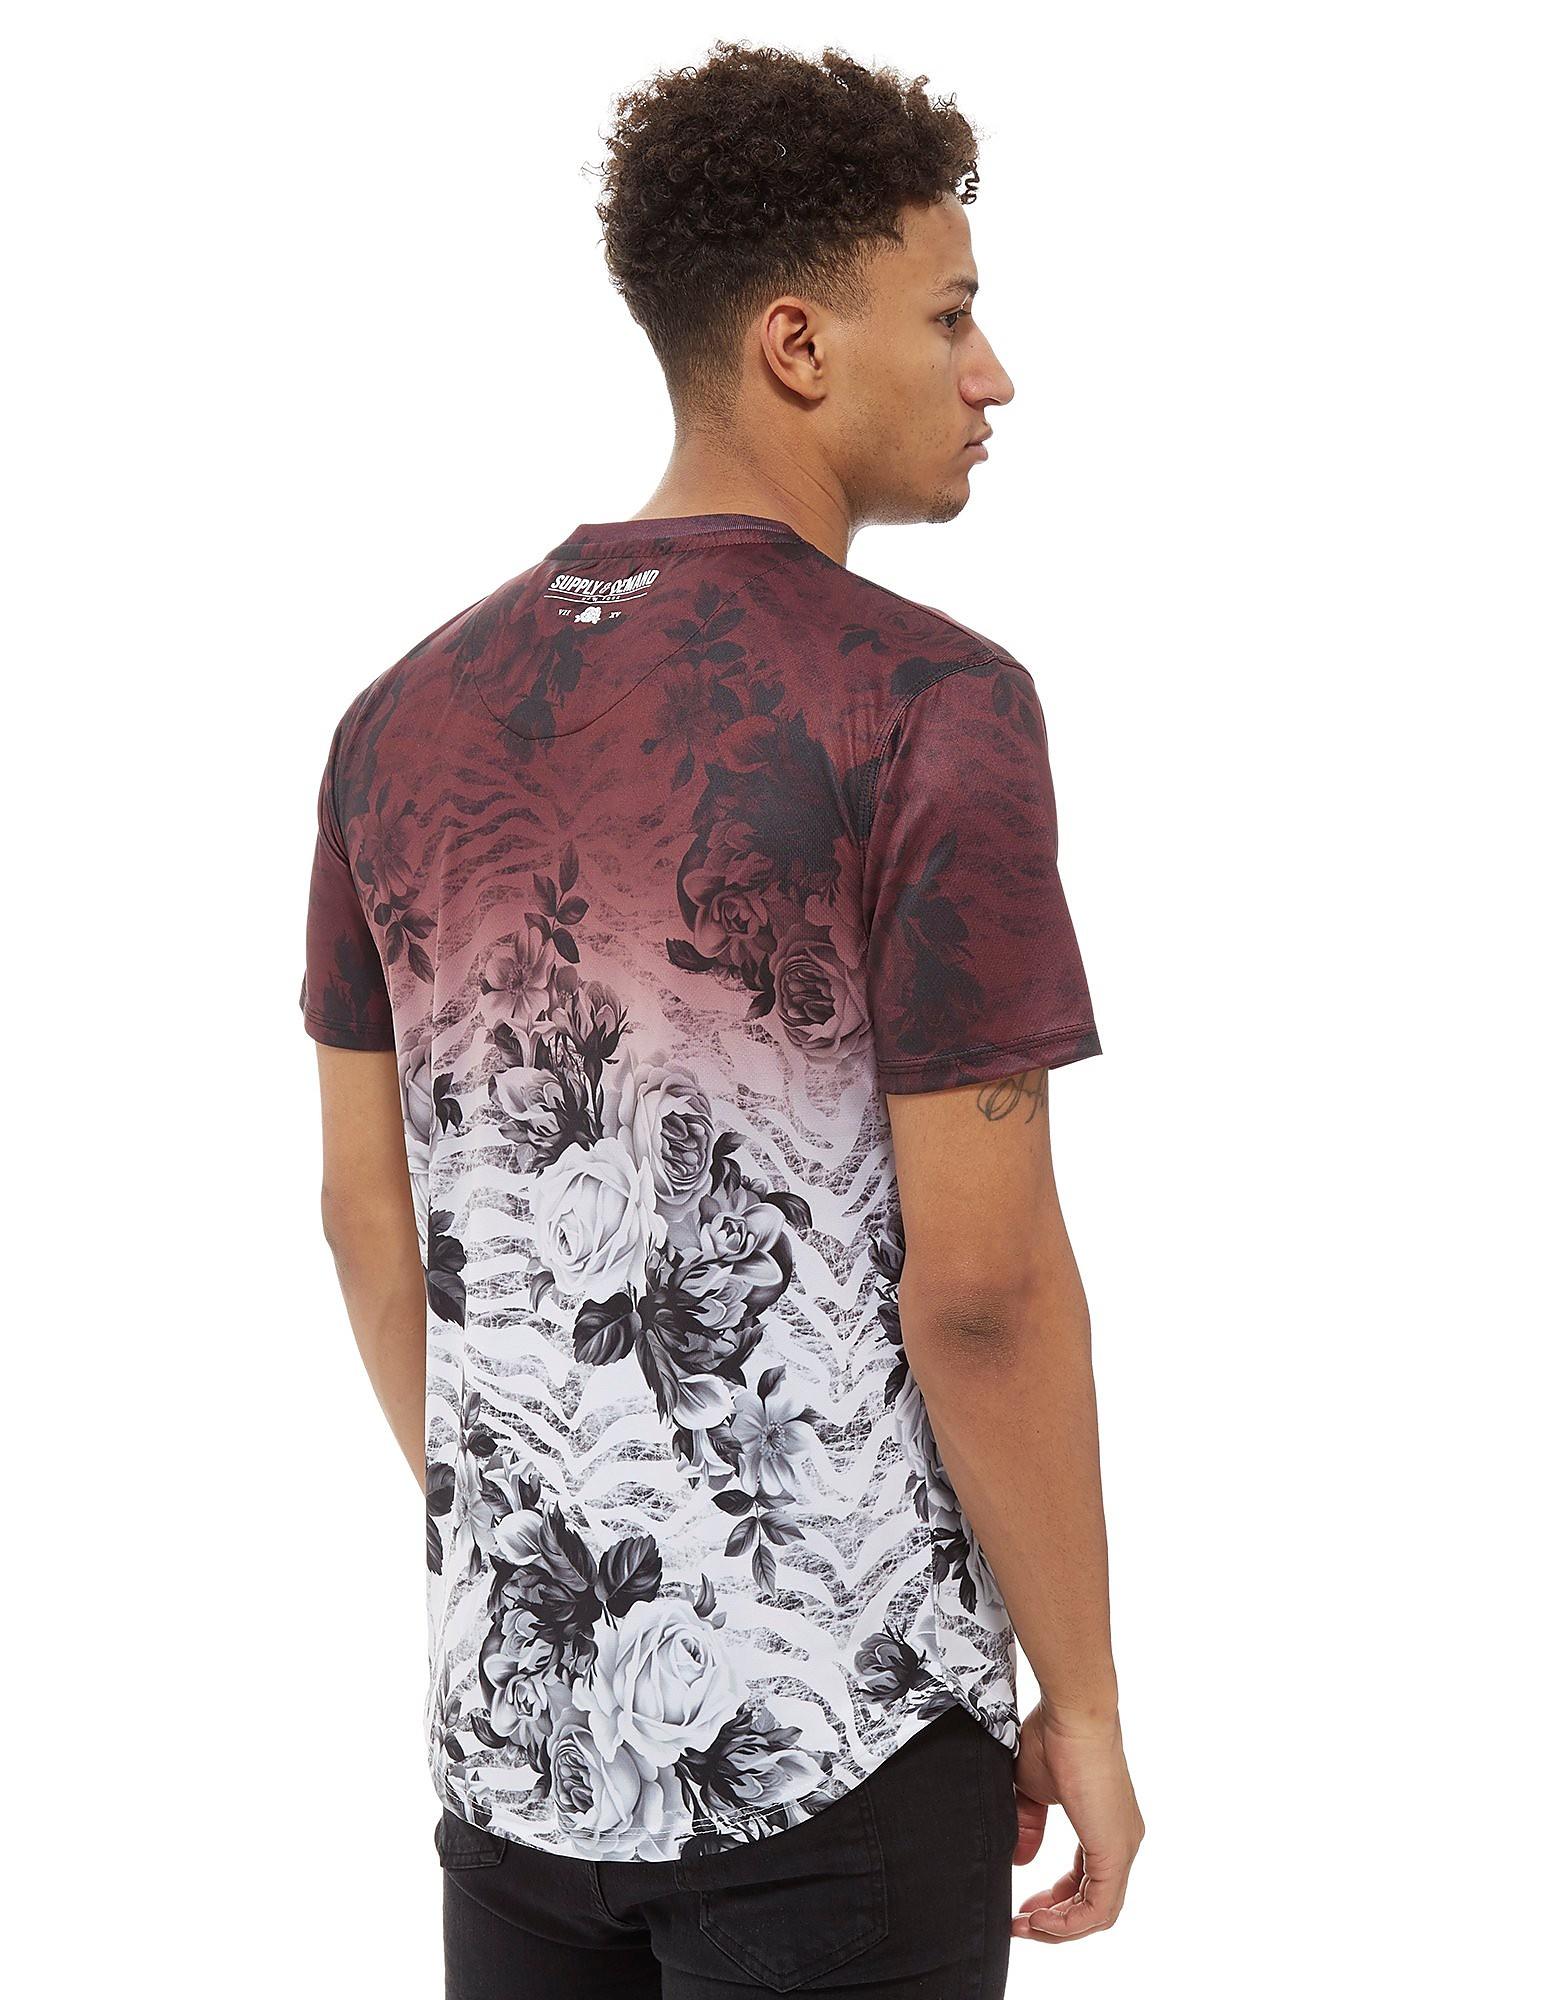 Supply & Demand Kingdom T-Shirt